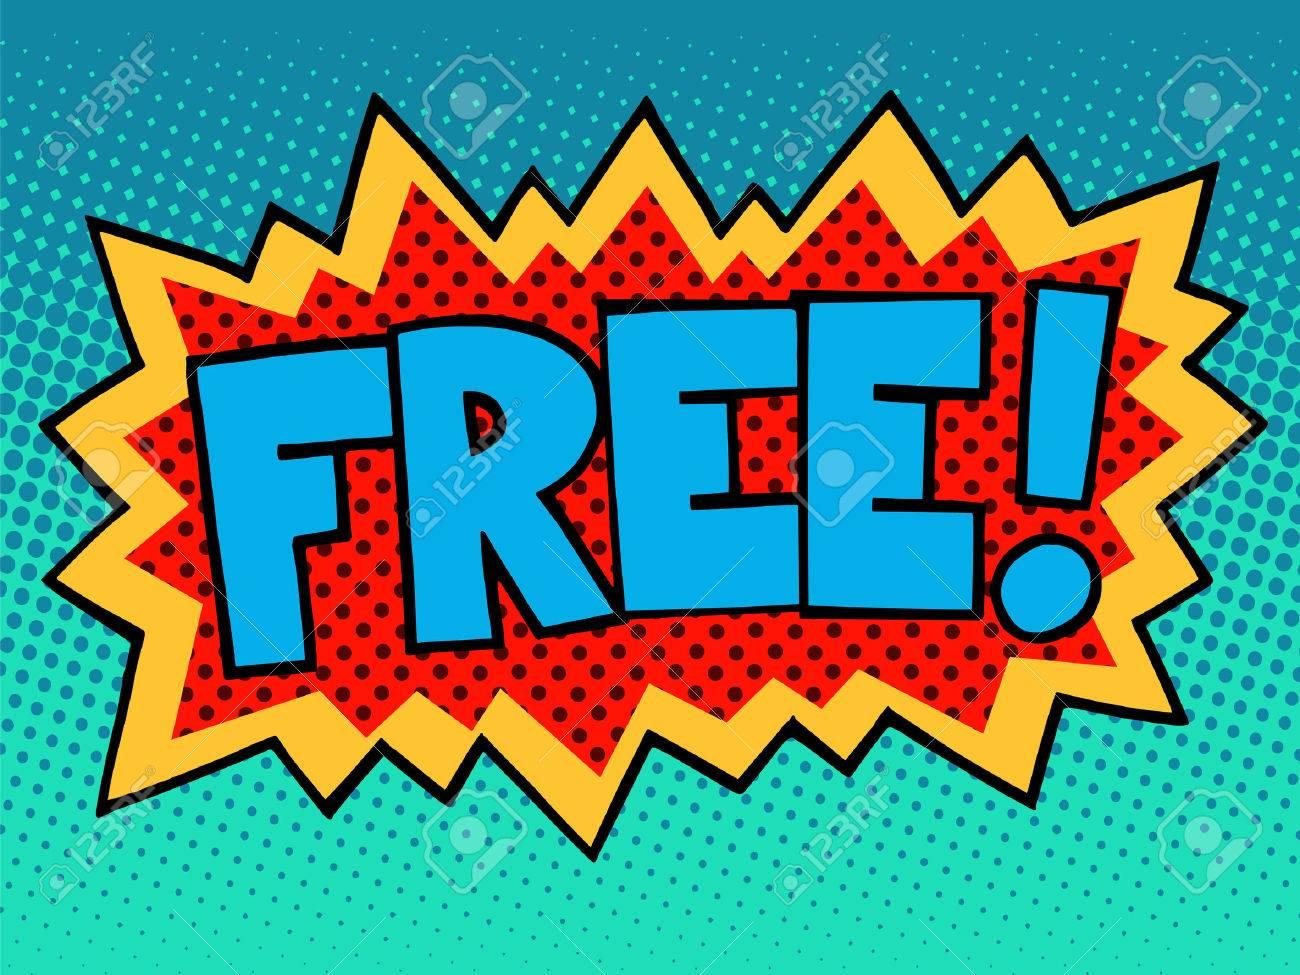 free comic book inscription pop art retro style royalty free